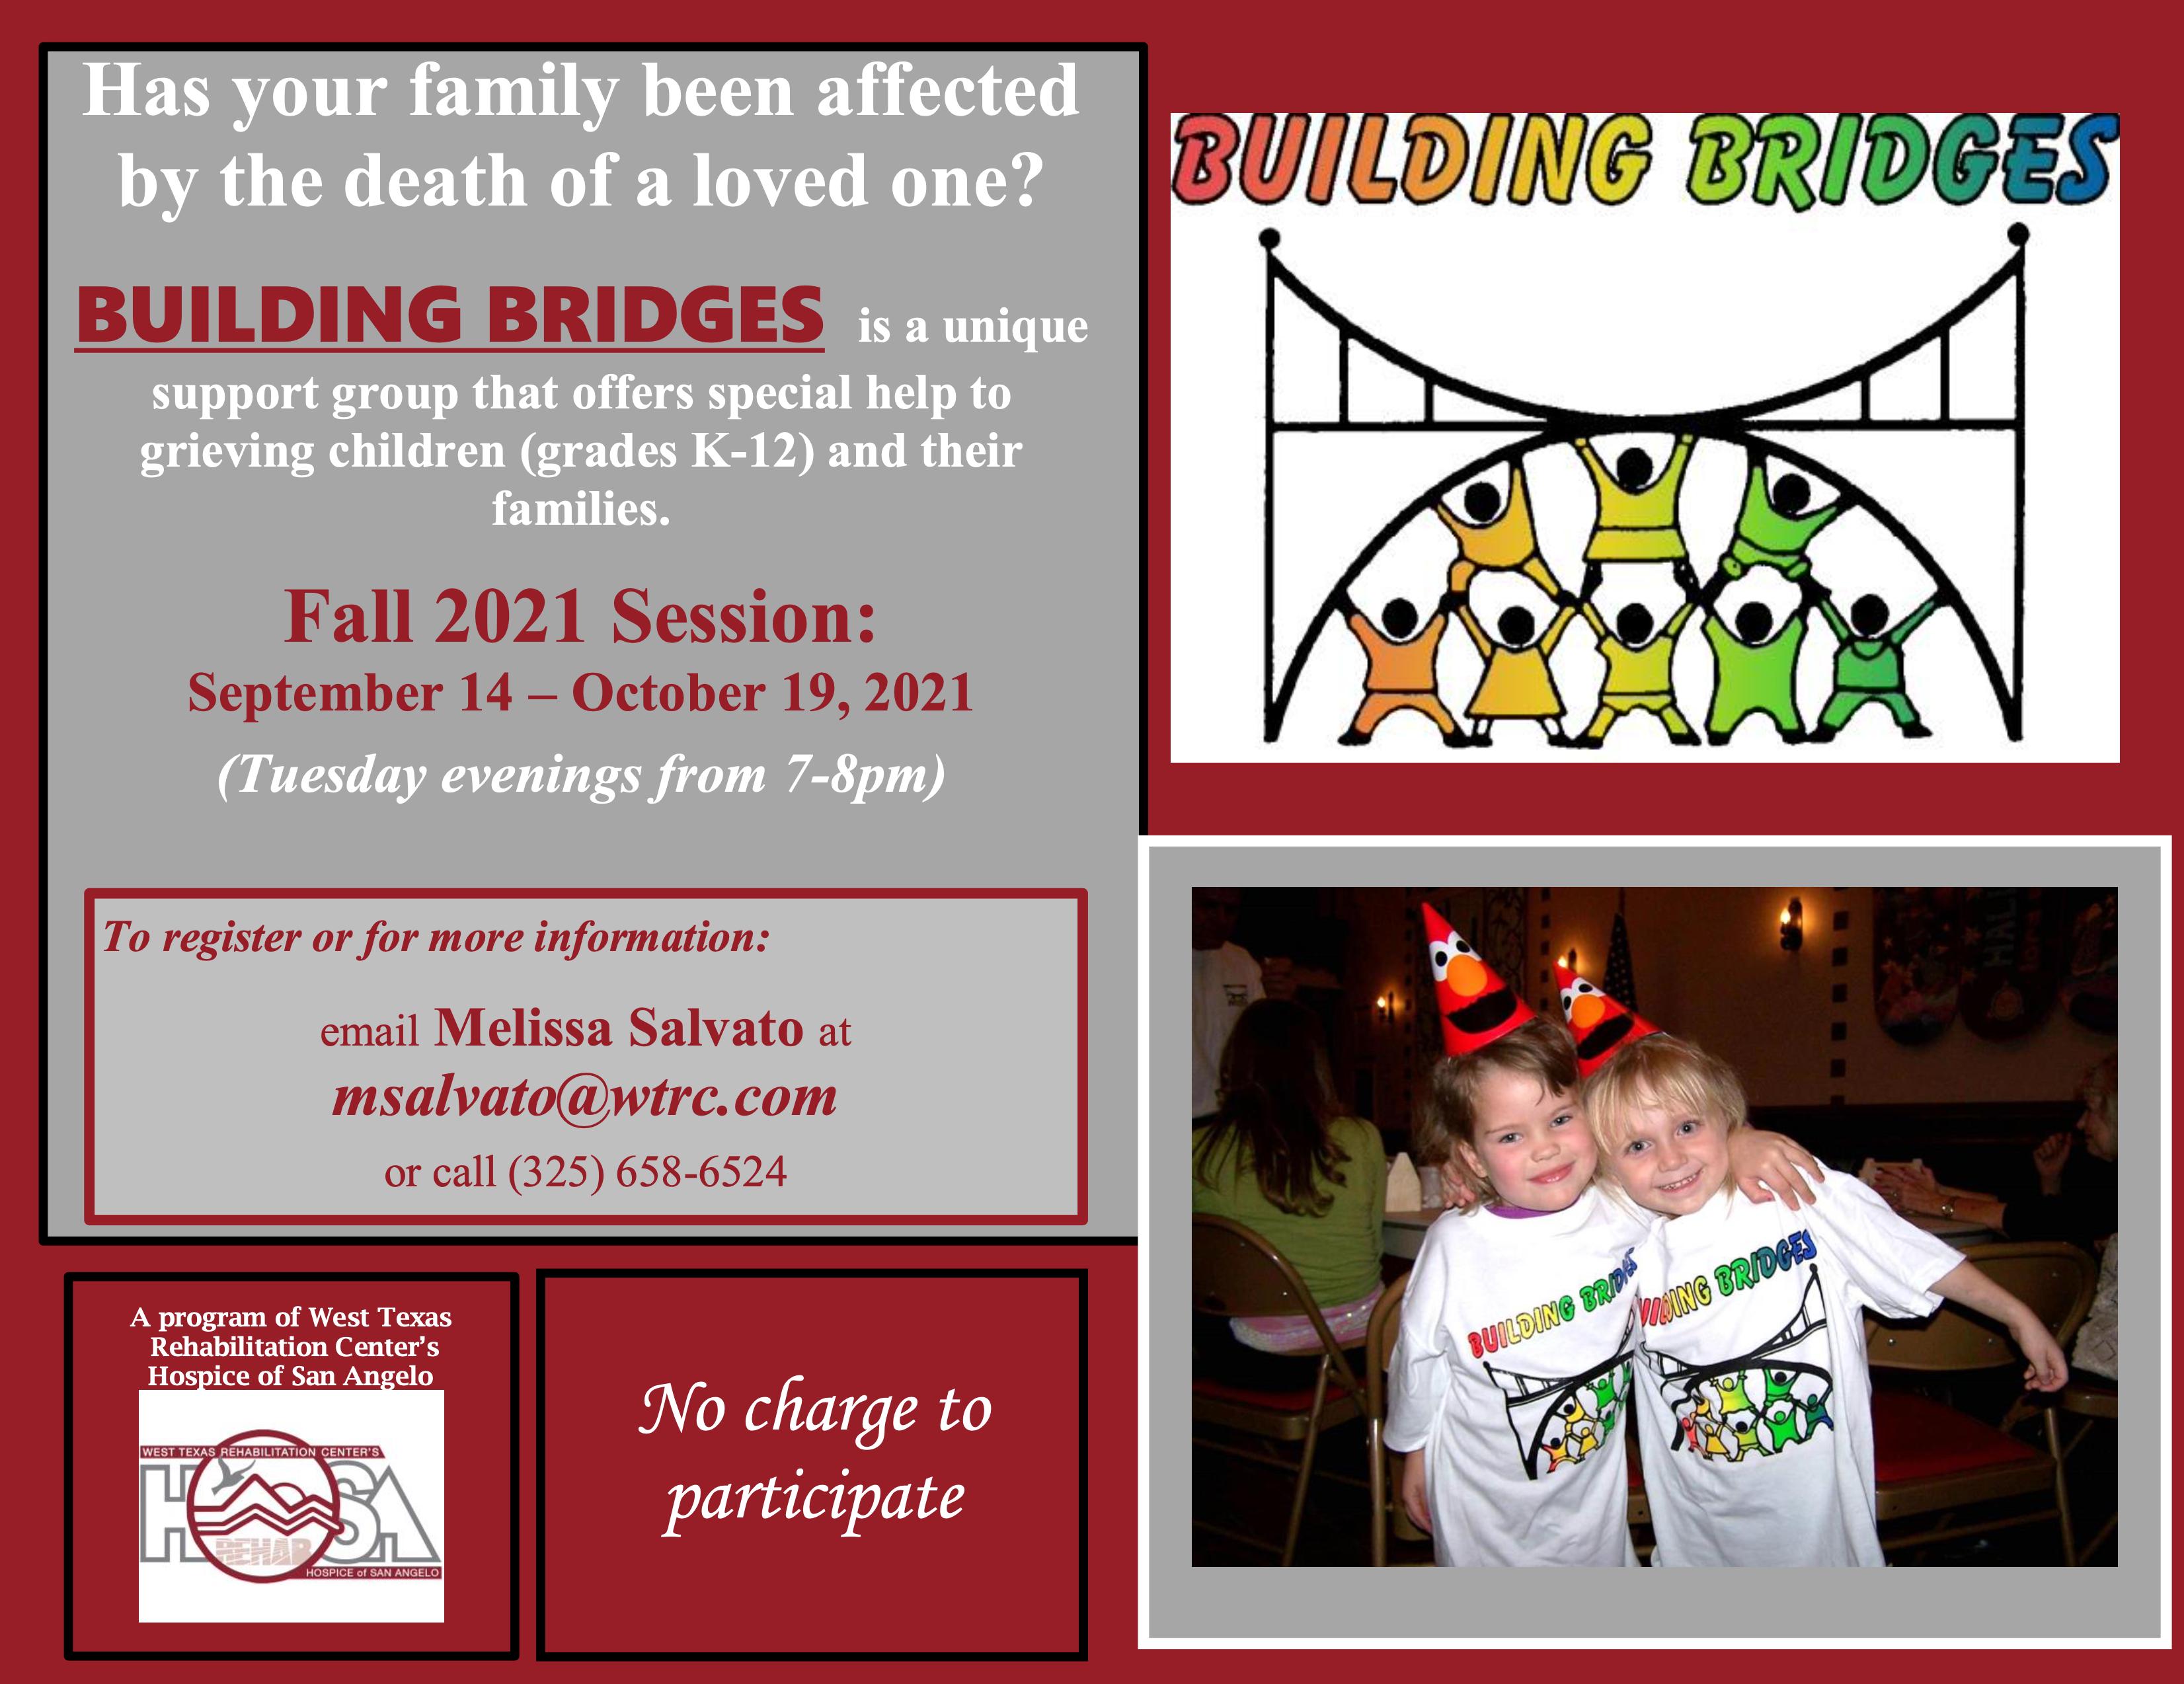 Building Bridges Fall 2021 Image